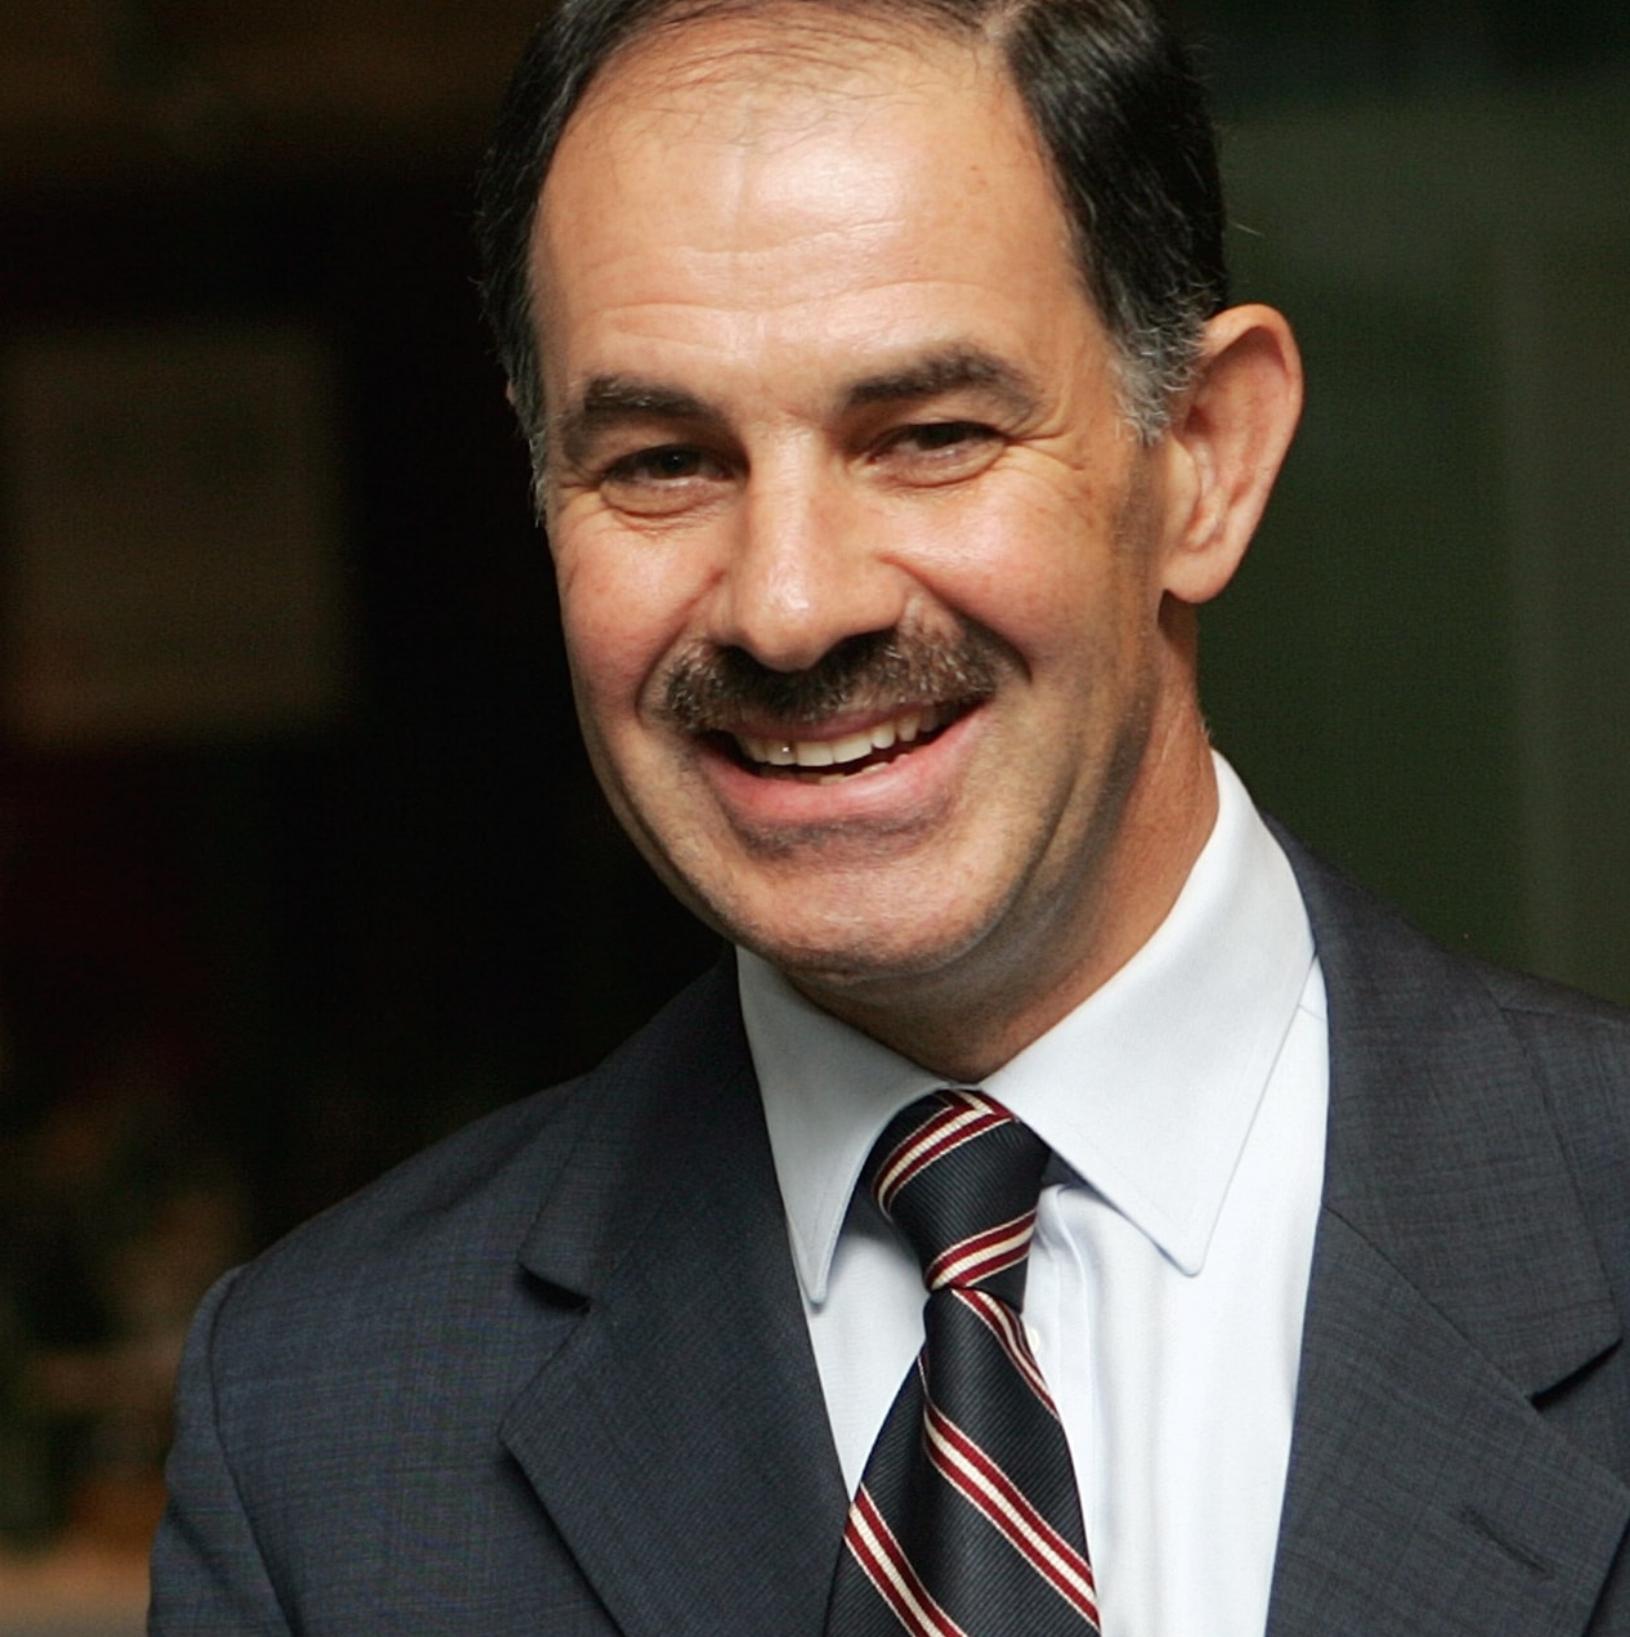 Dominique Biedermann - Ökonom